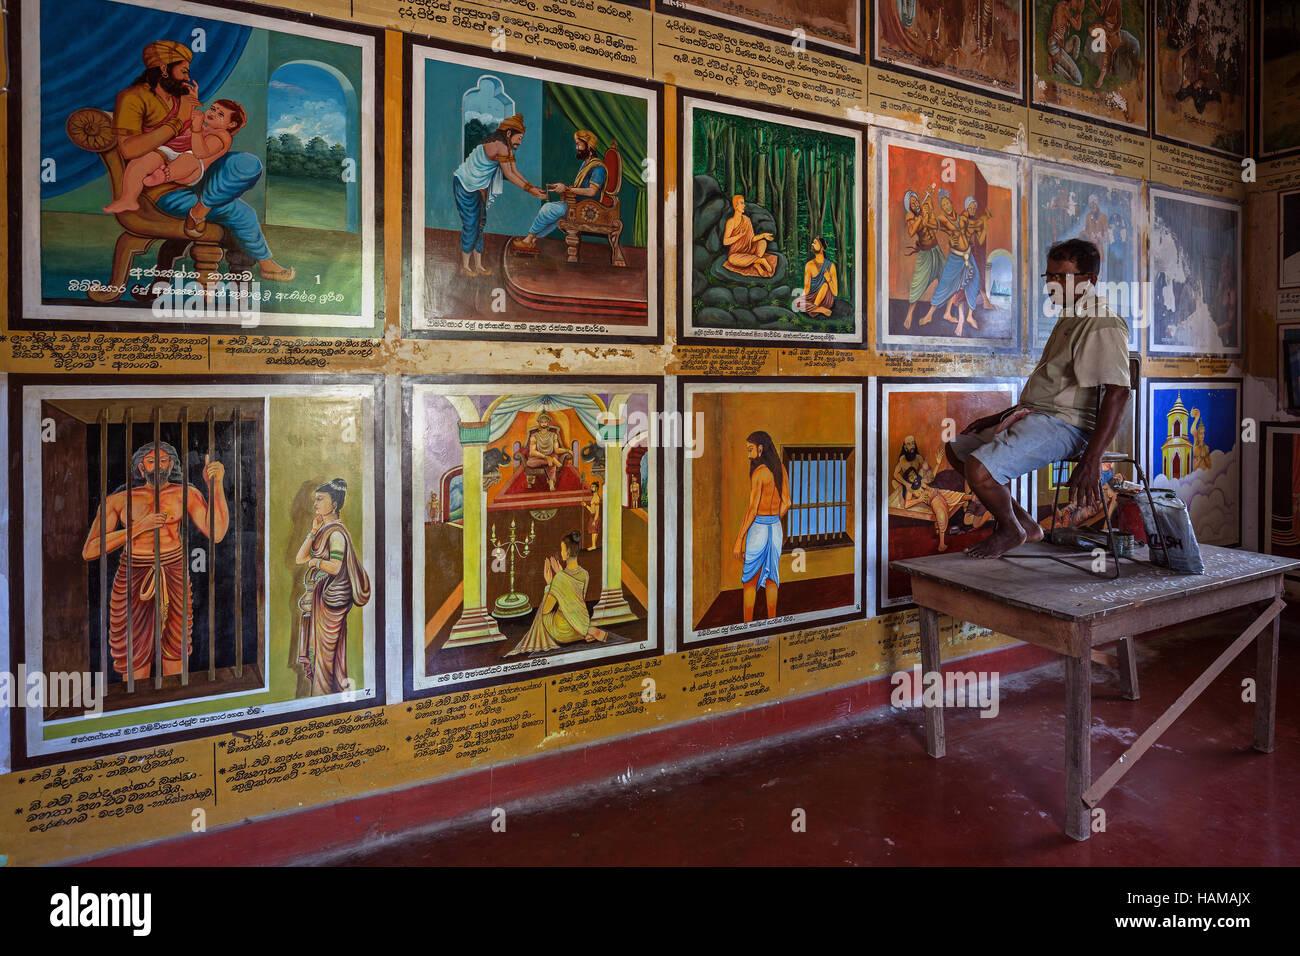 Singhalese man restoring murals, scenes from life of Buddha, Weherahena Temple, Matara, Southern Province, Sri Lanka - Stock Image